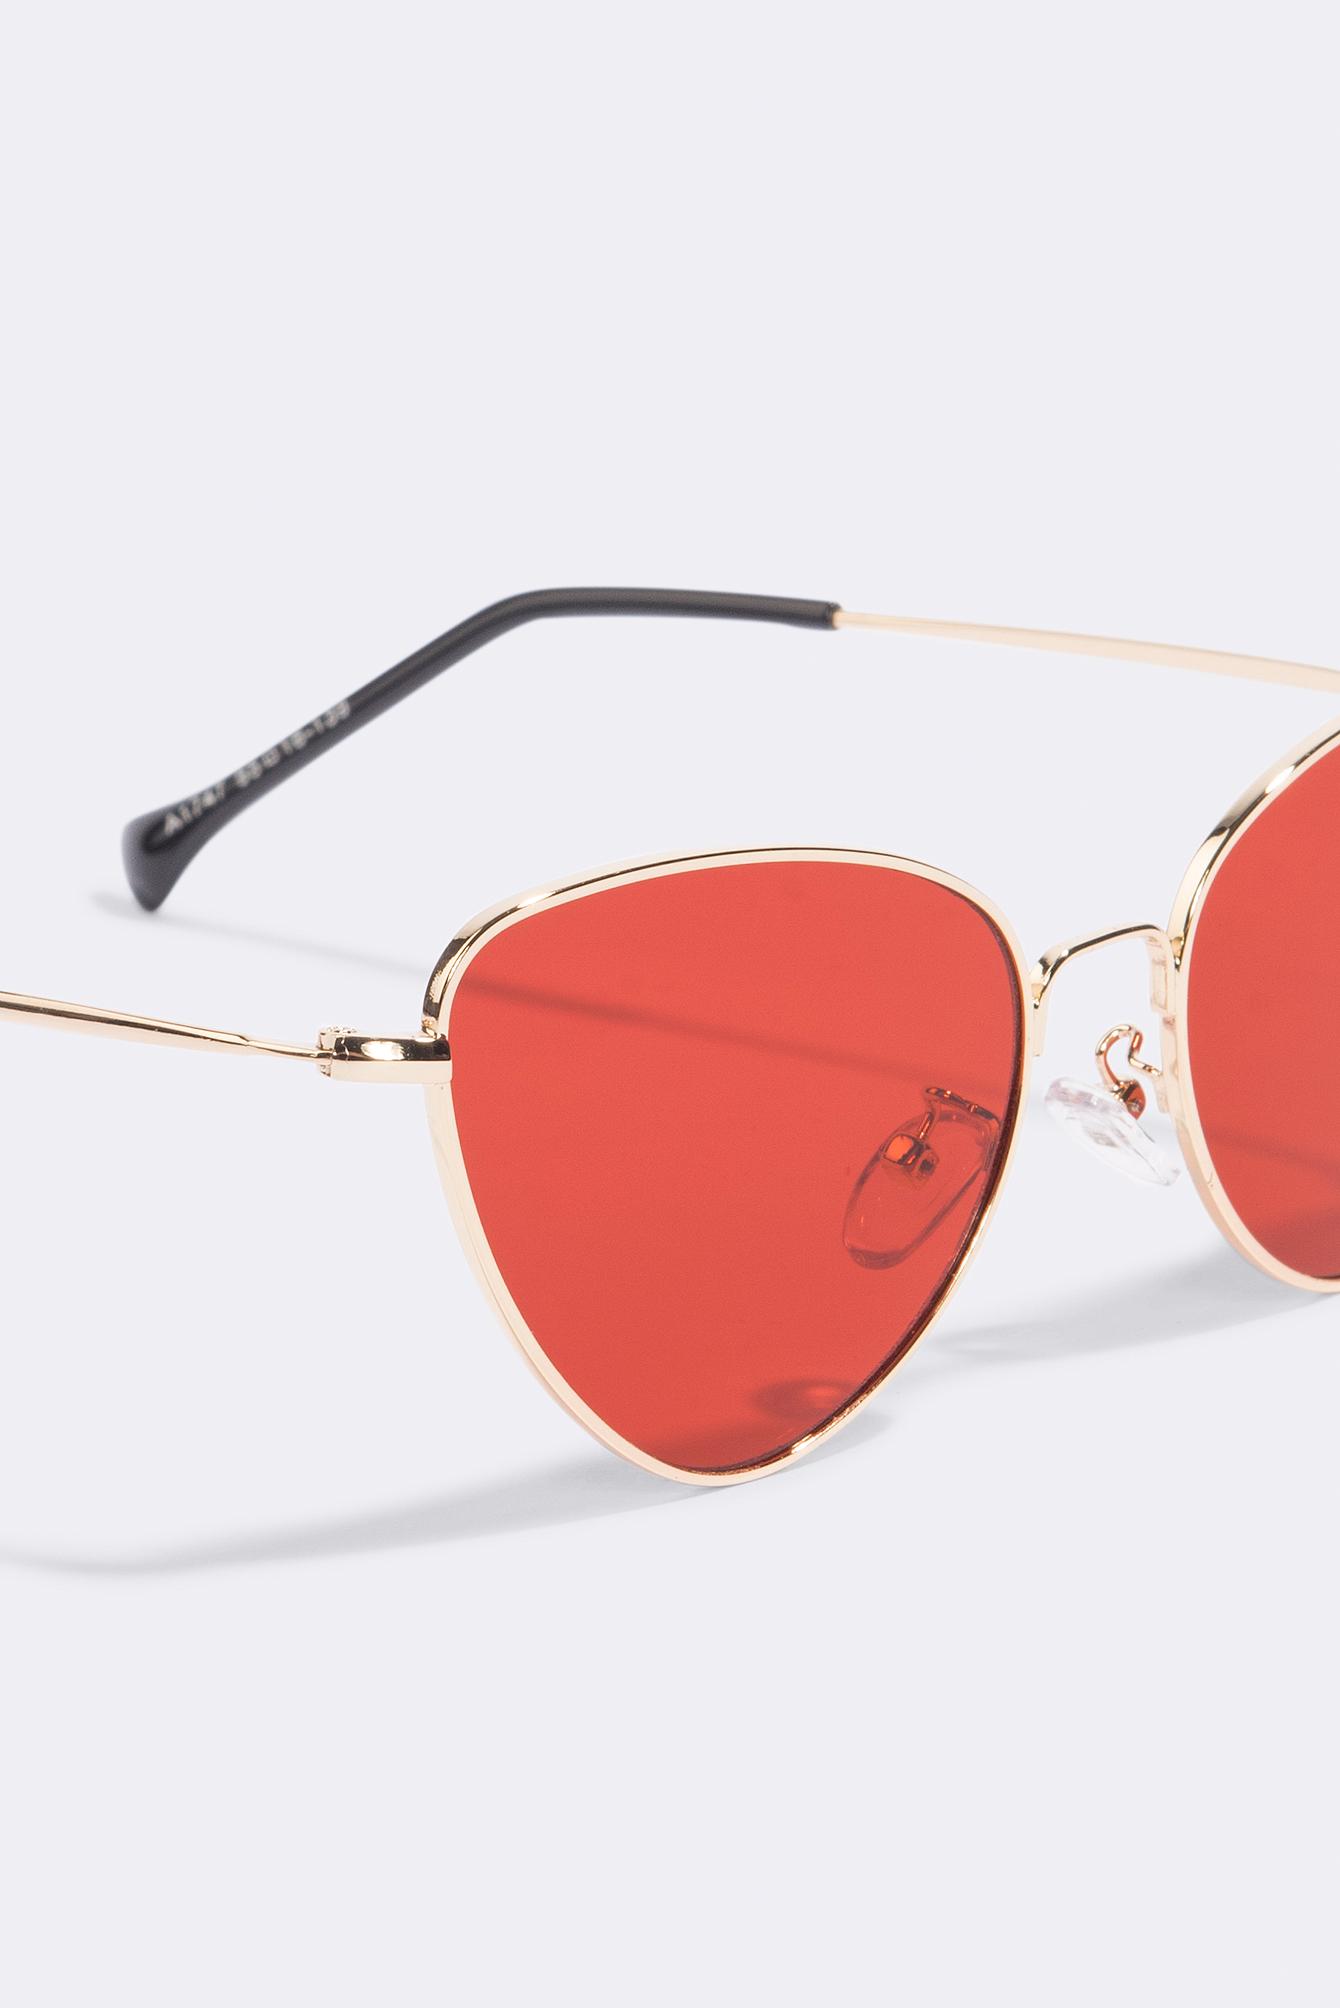 NA-KD Accessories Metal Frame Cat Eye Sunglasses - Red jjW1ubzJd